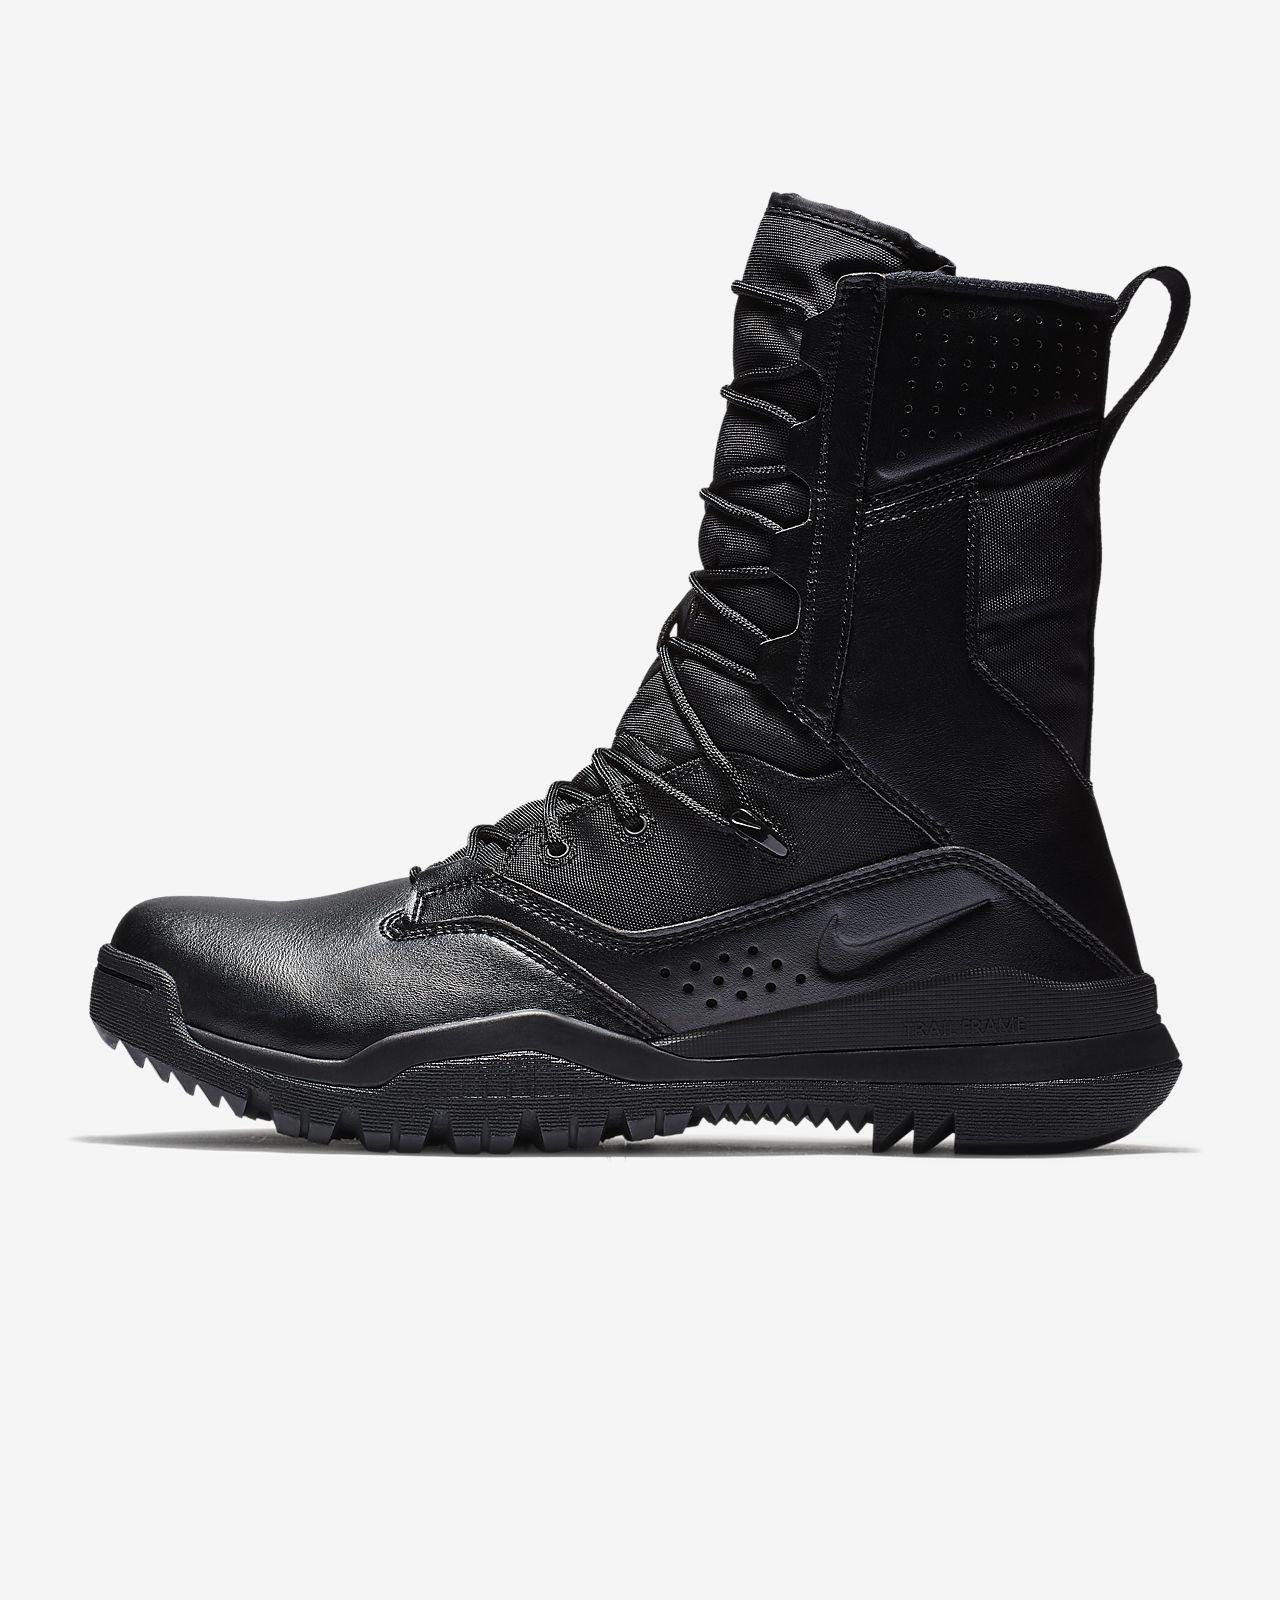 "Ботинки в армейском стиле Nike SFB Field 2 8"""